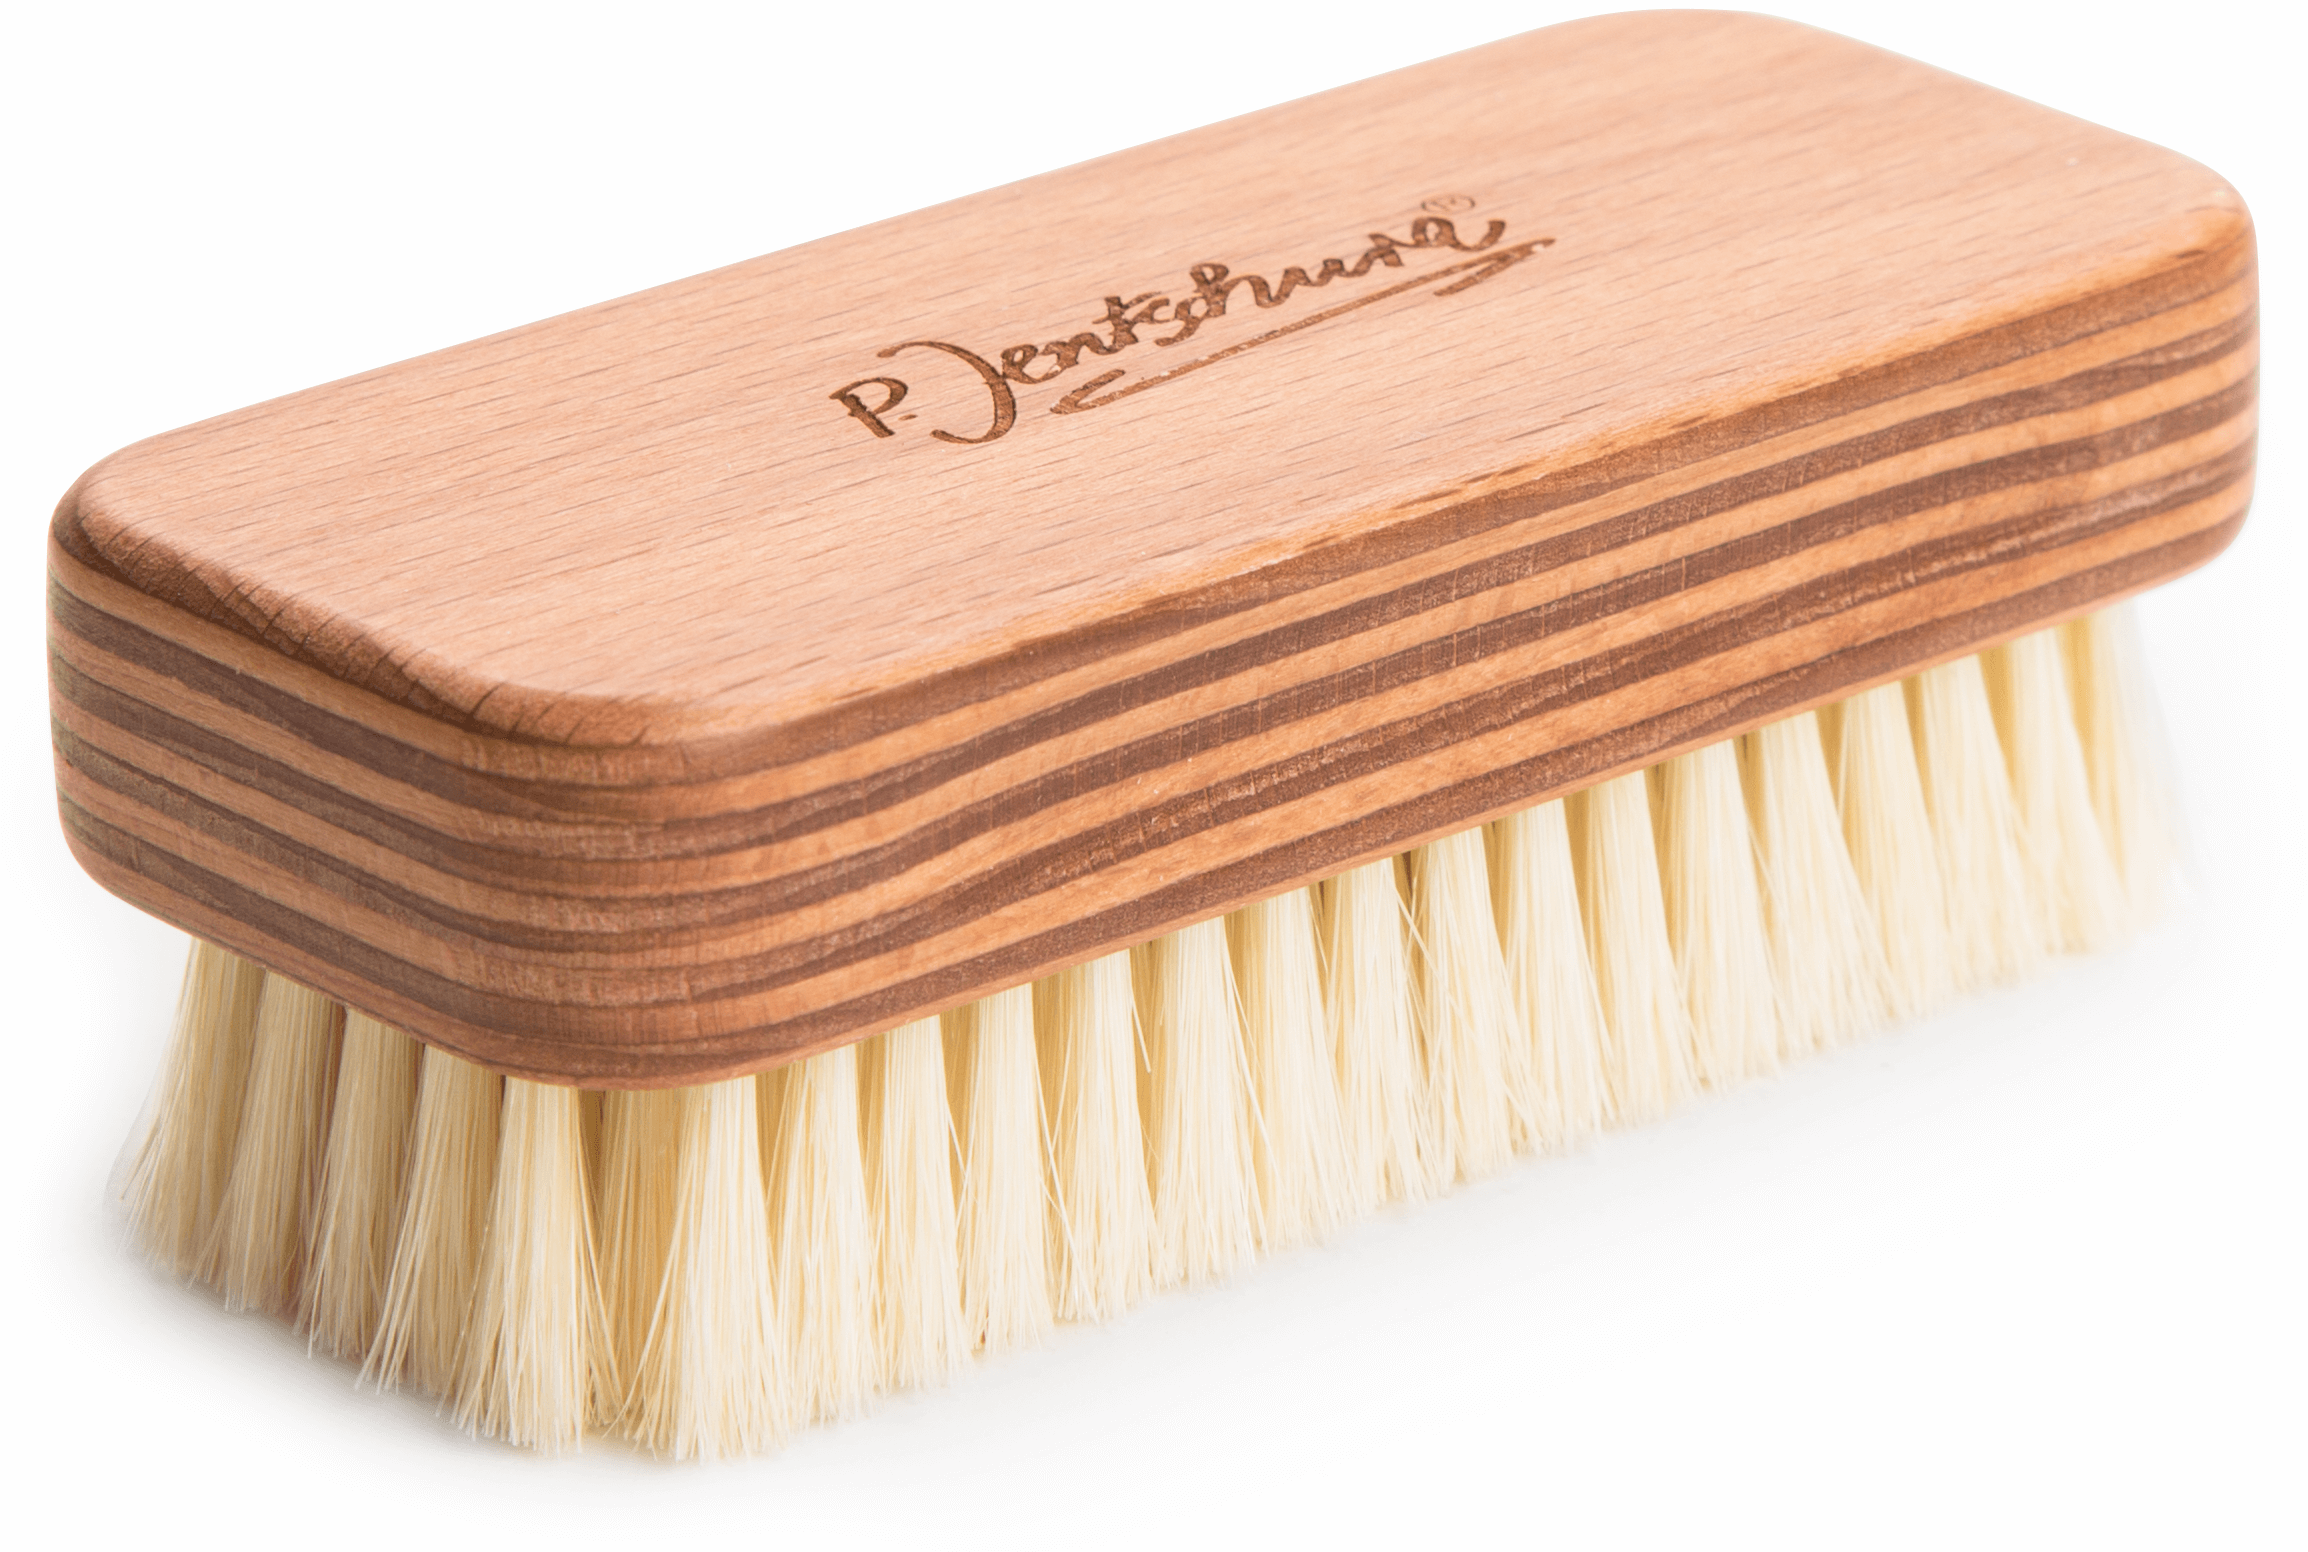 Kosmetikbürste (Buche, Schichtholz)